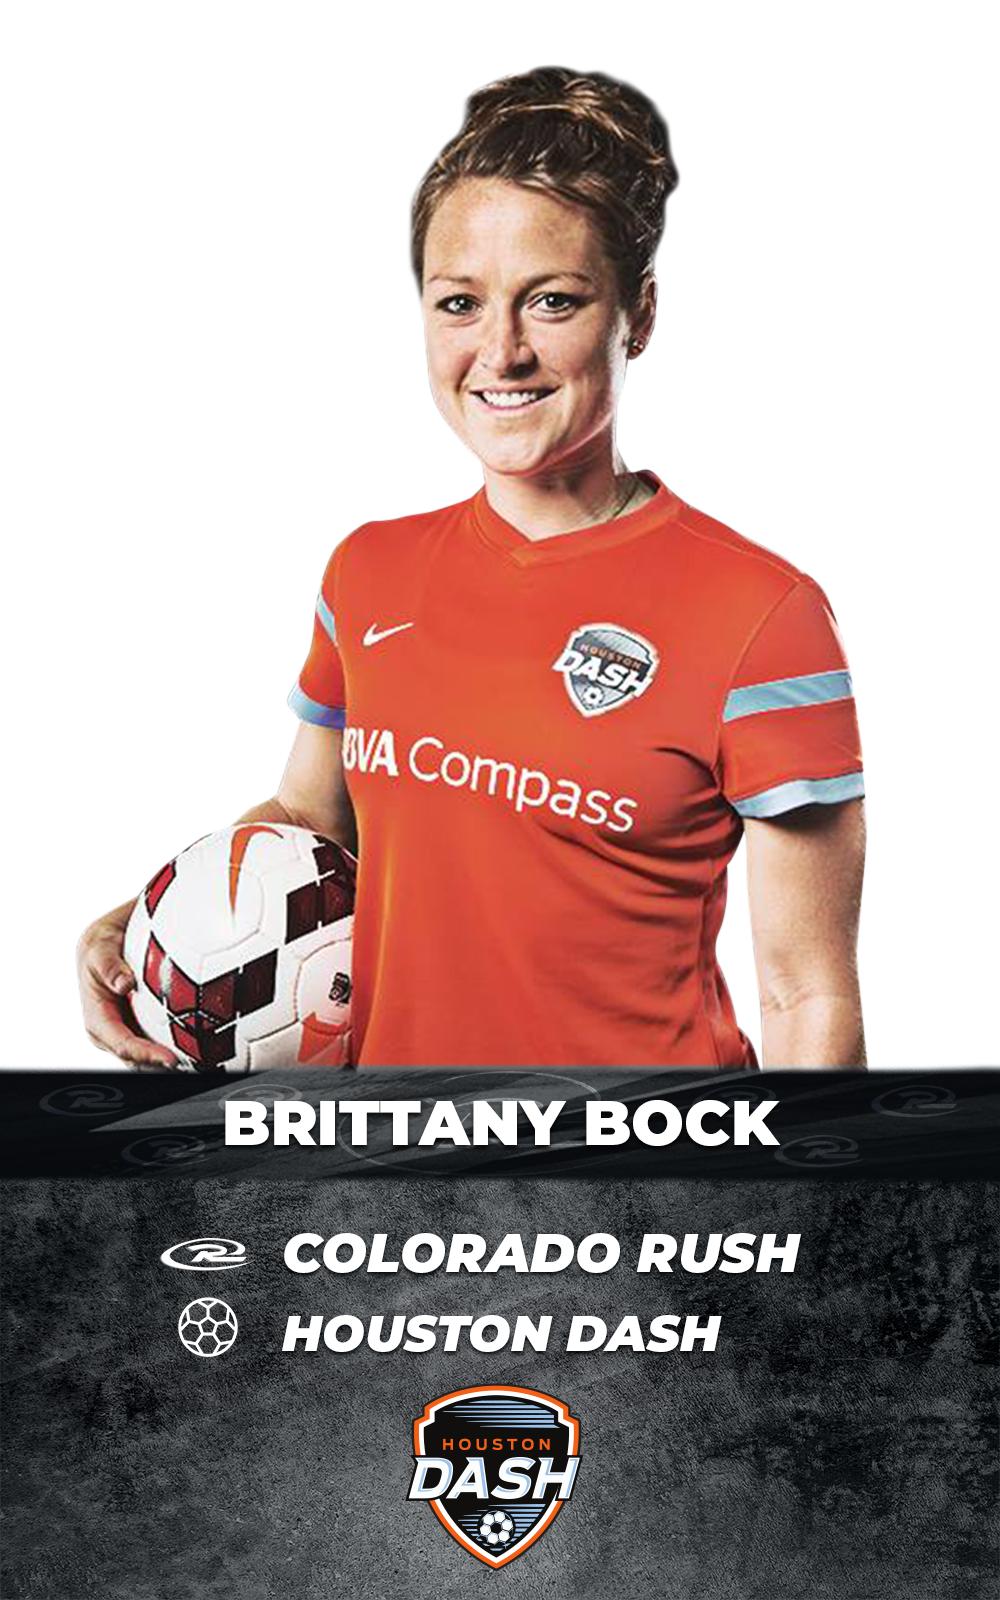 Brittany-Bock